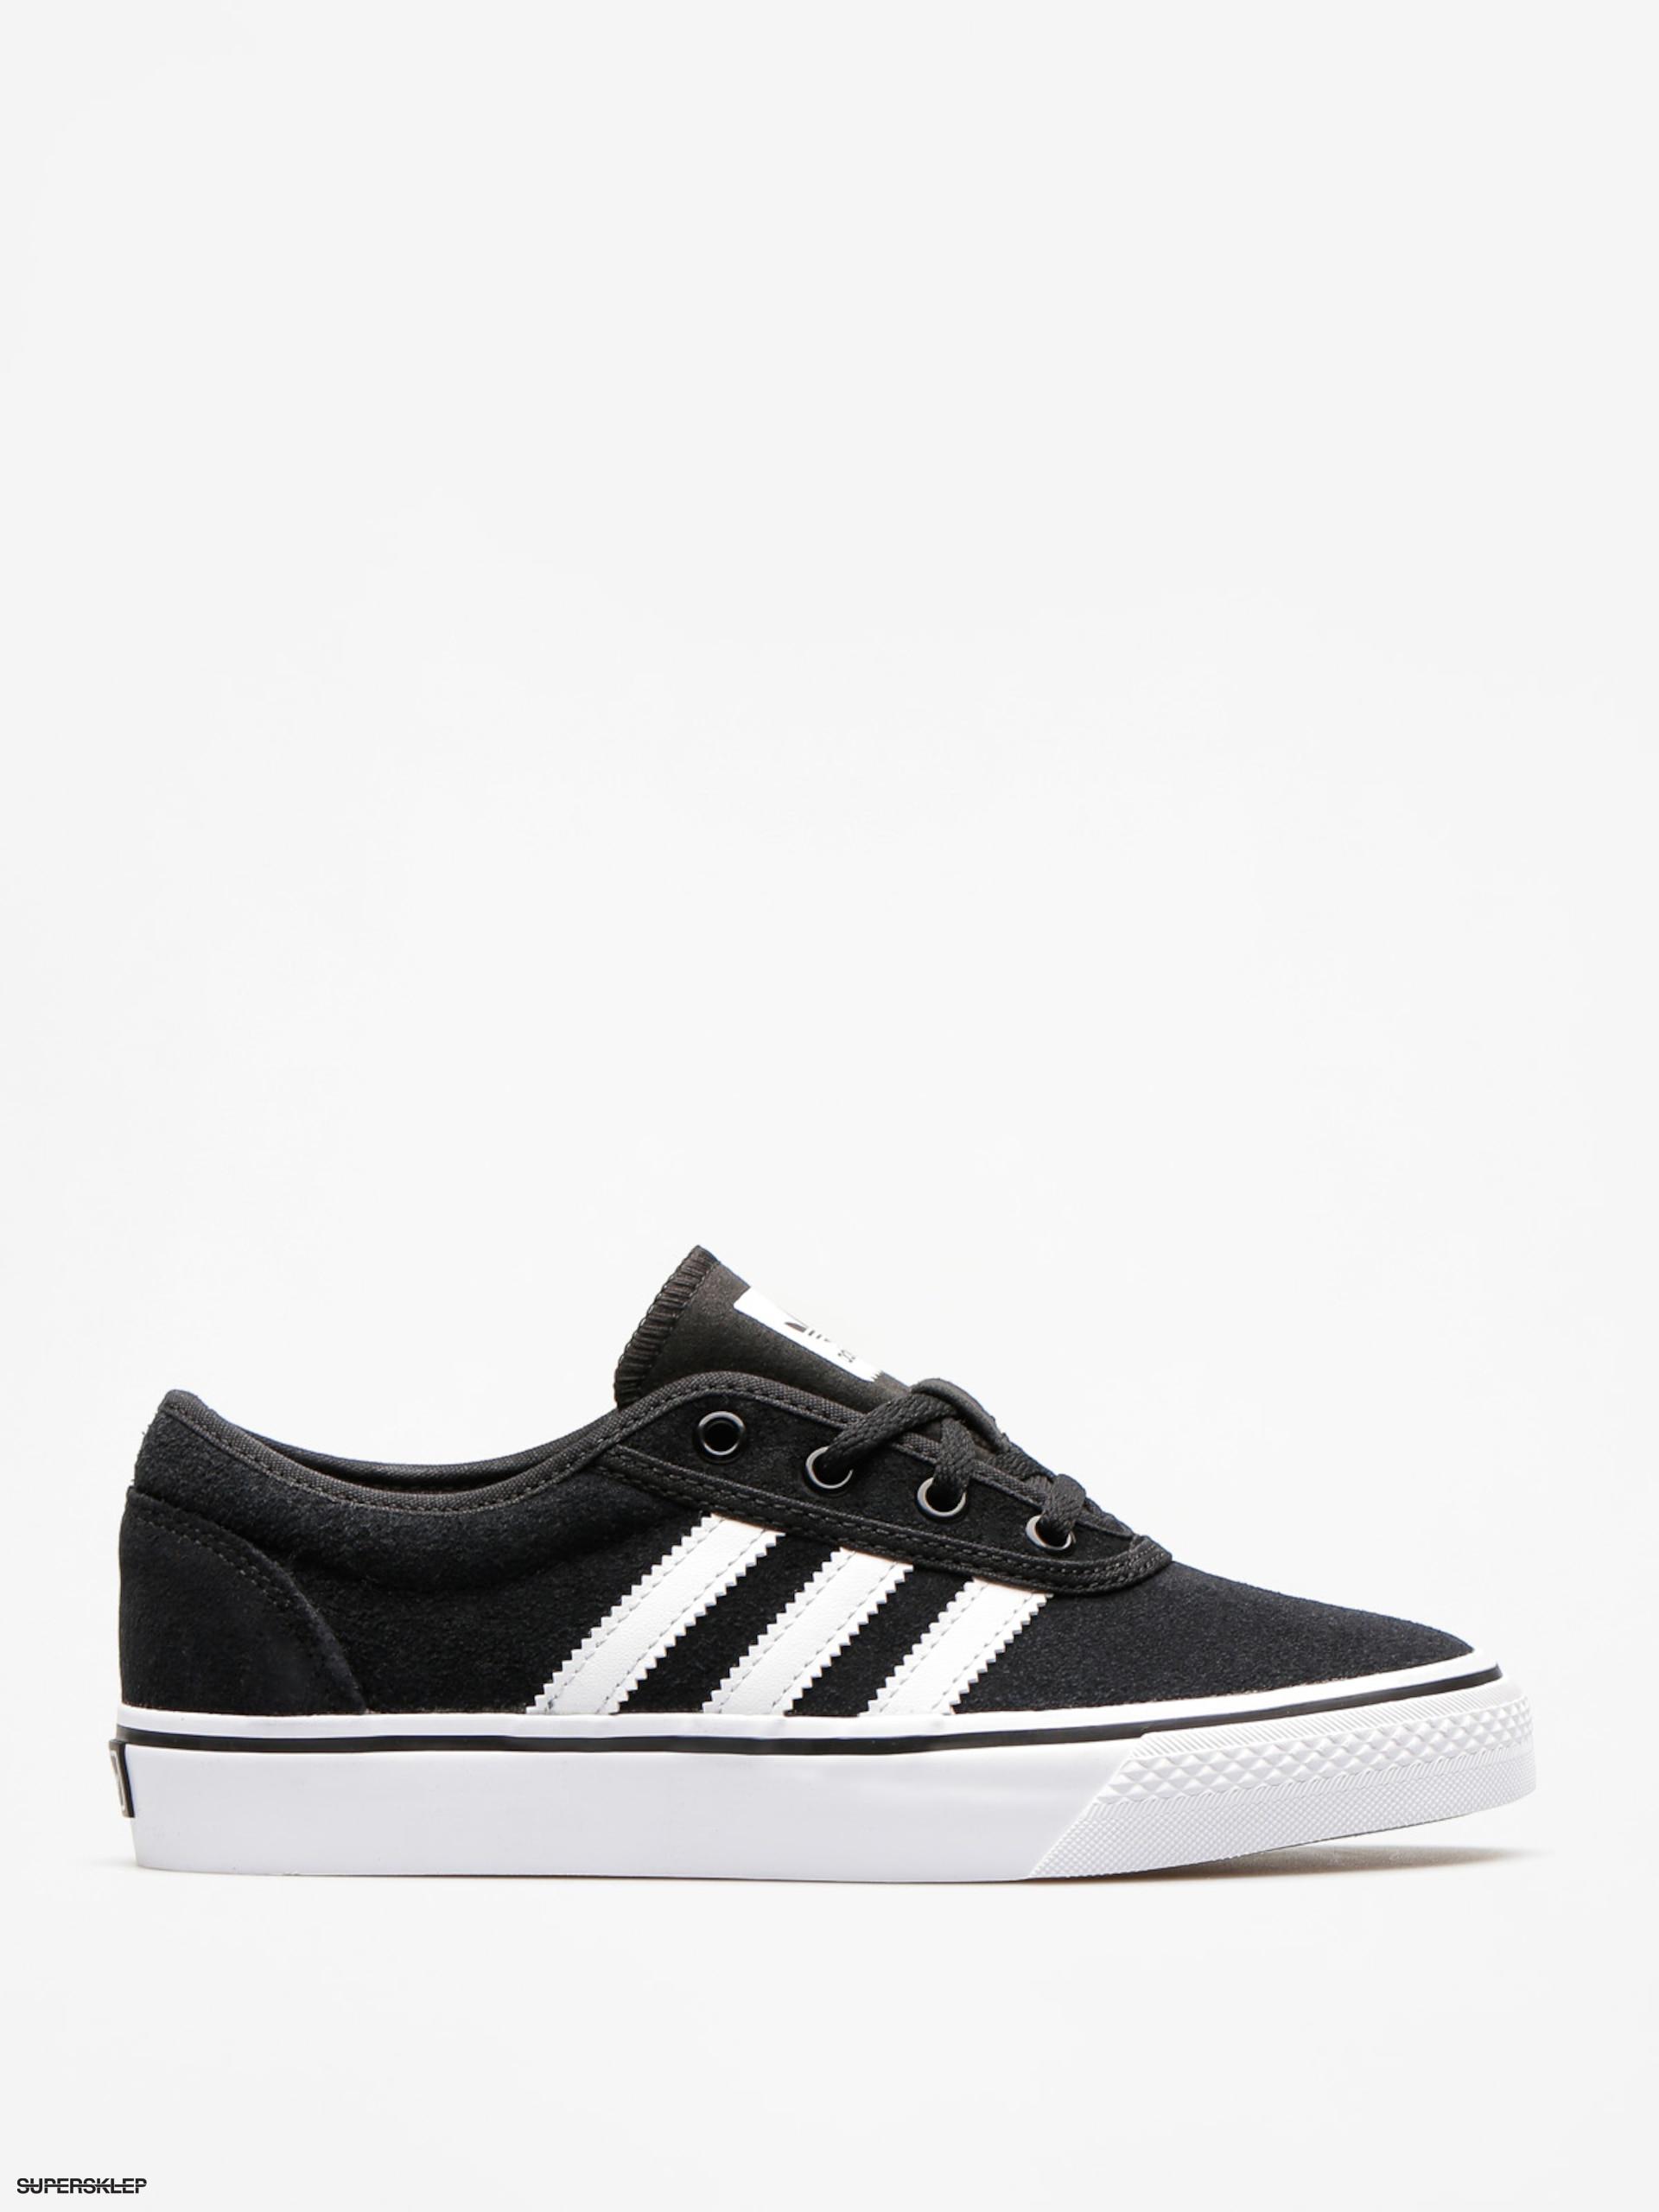 c9a3cd5d937d8 Topánky adidas Adi Ease (cblack/ftwwht/cblack)